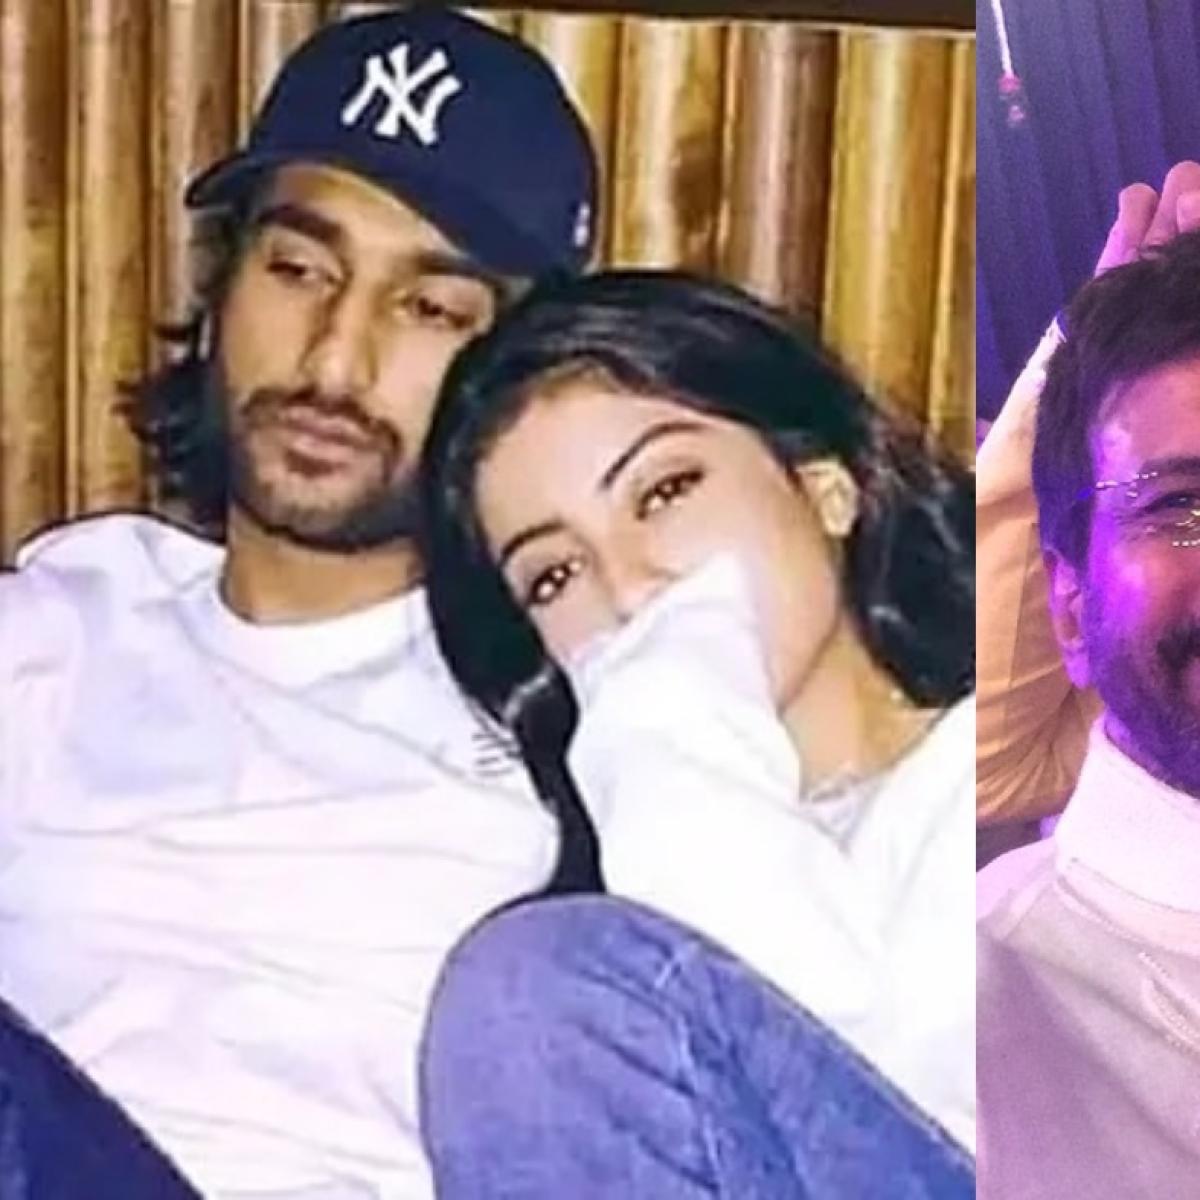 'People want content': Jaaved Jaaferi on rumours of son Meezaan dating Big B's granddaughter Navya Naveli Nanda